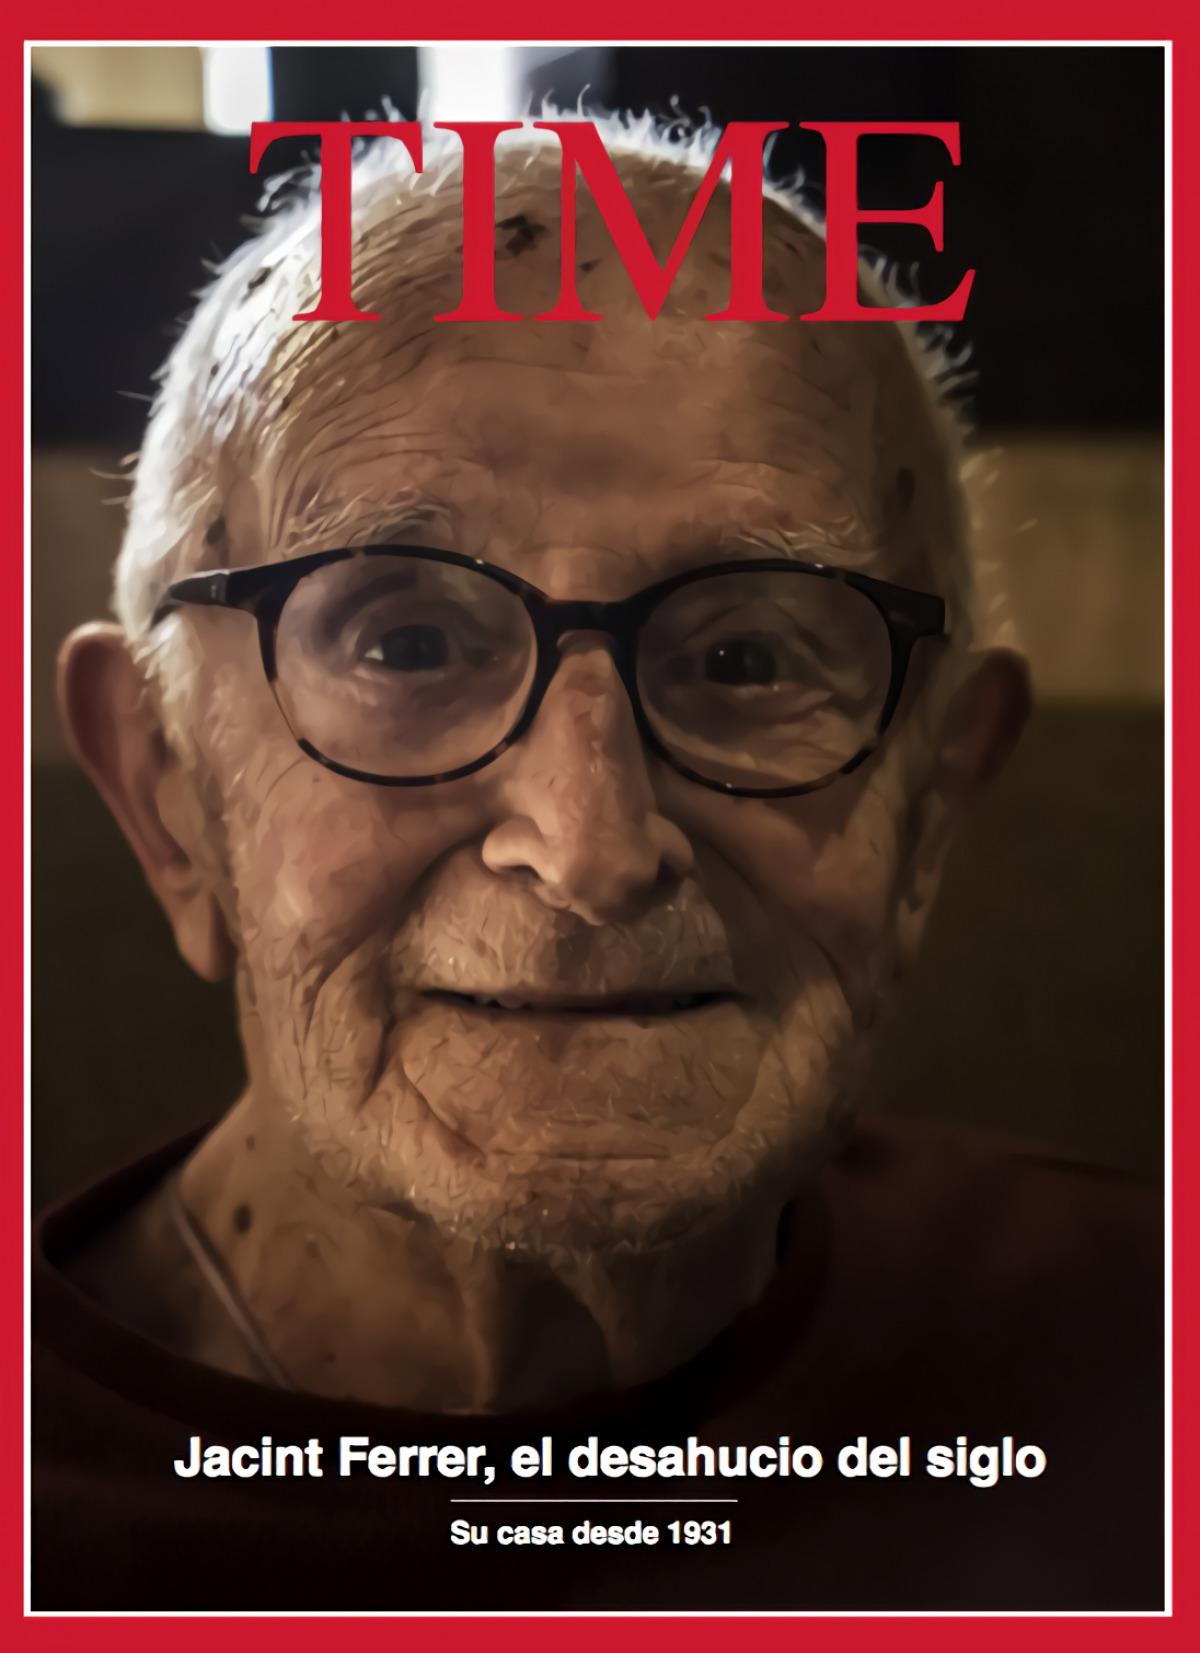 TIME: Jacint Ferrer, el desahucio del siglo